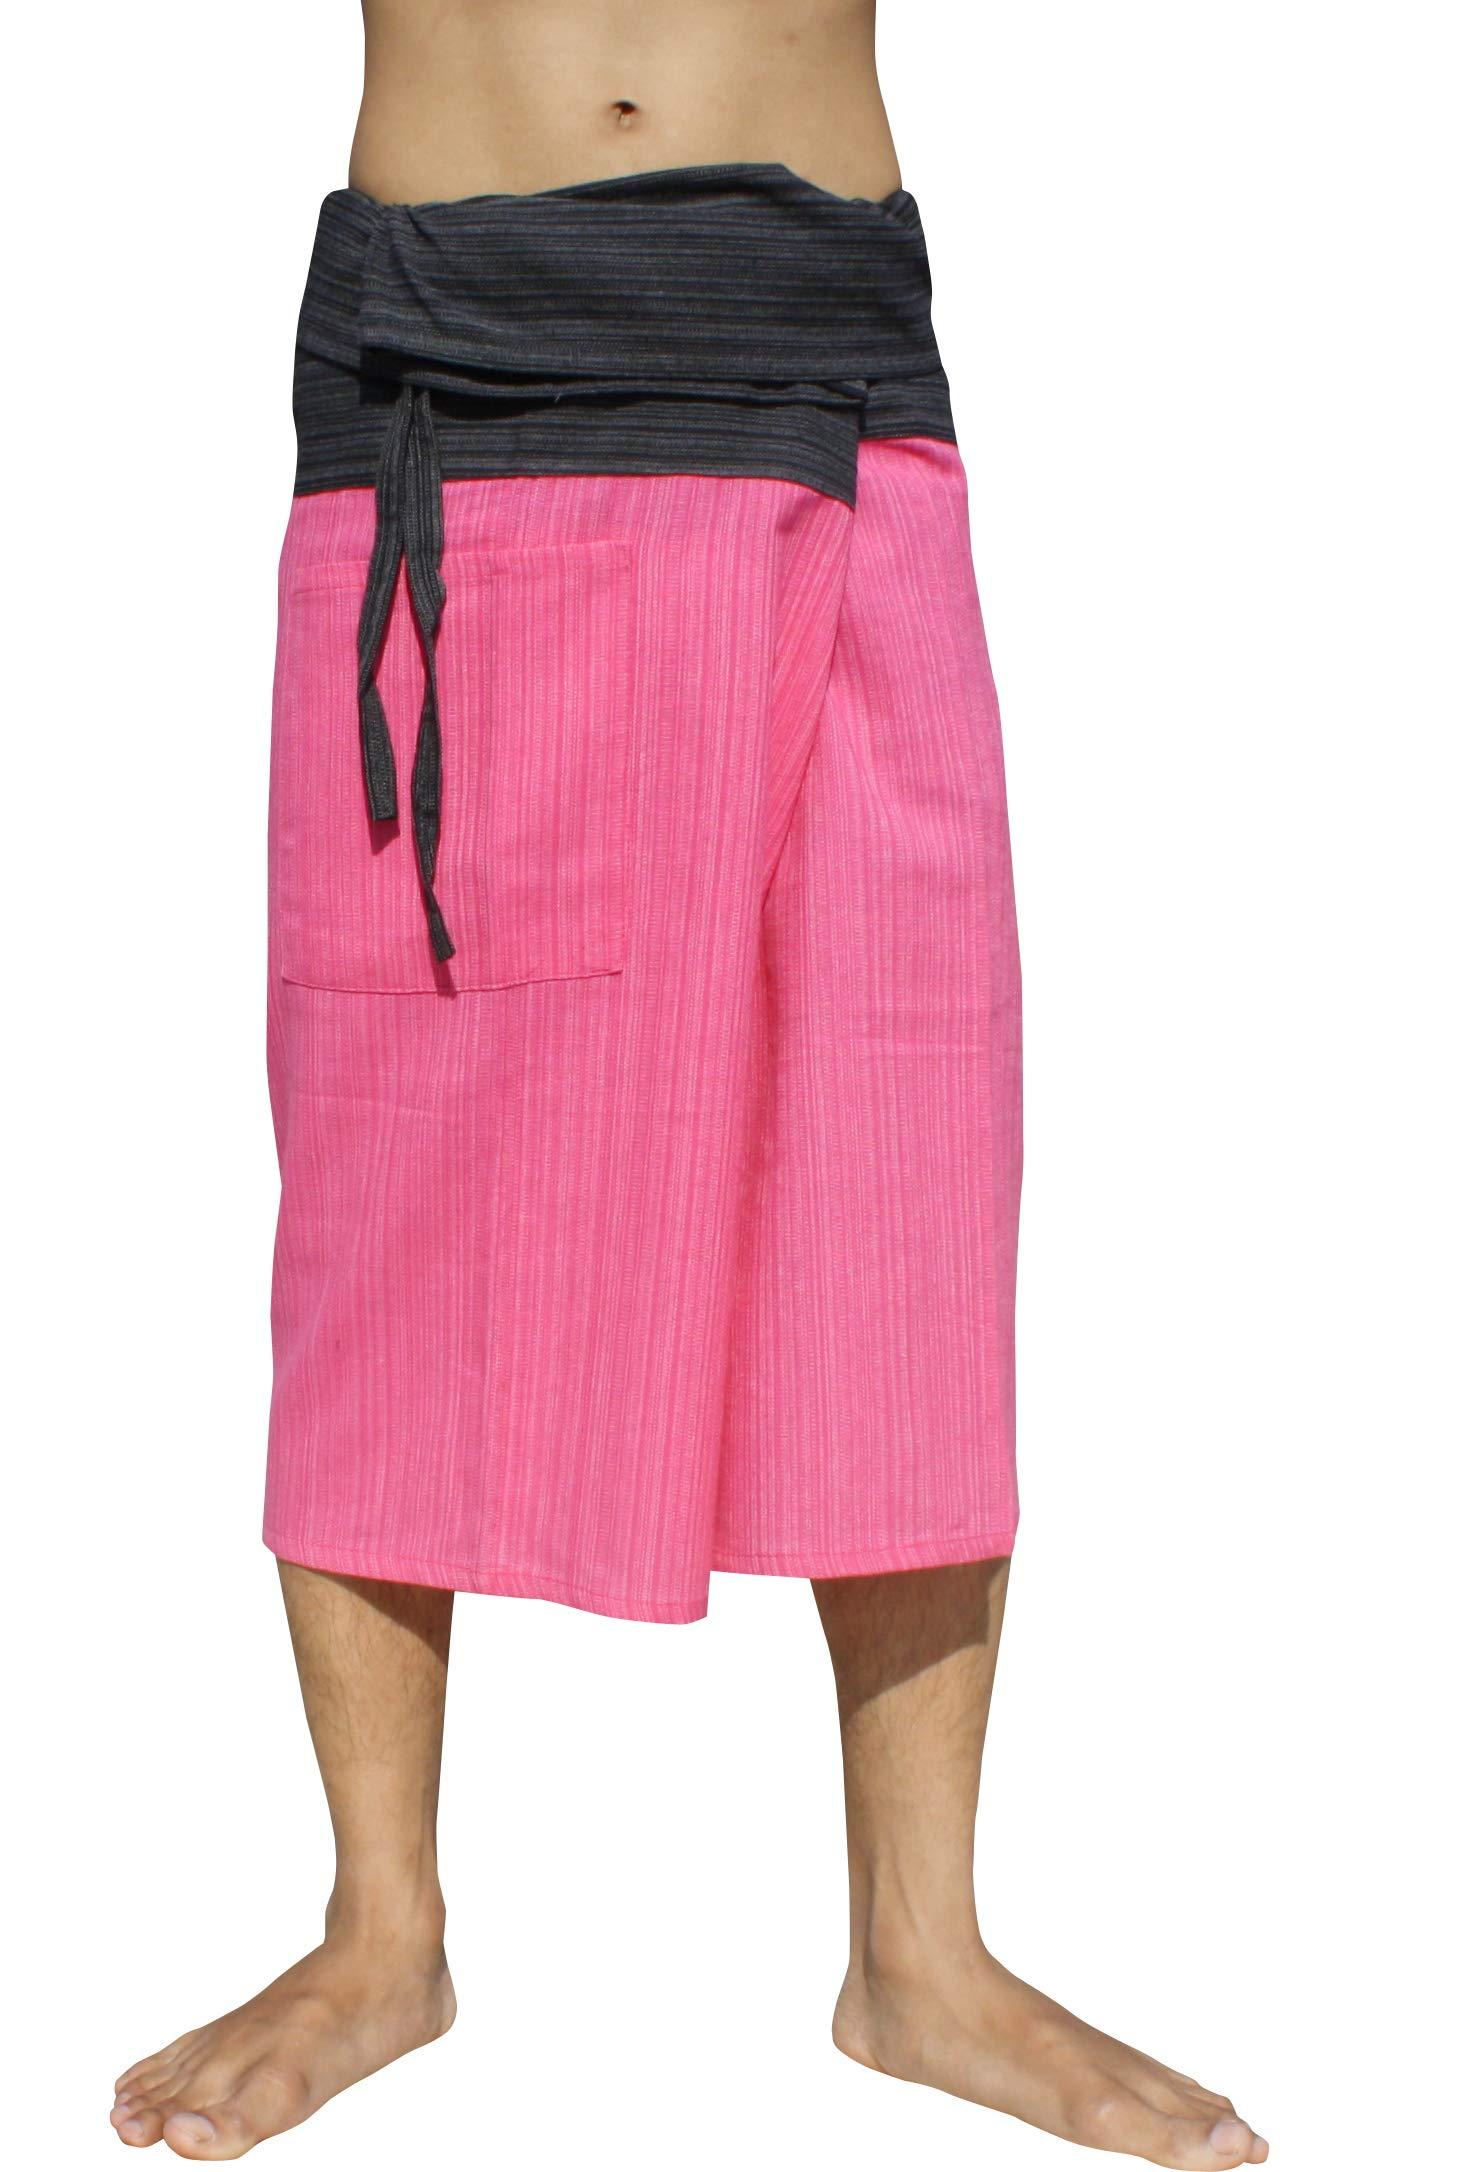 Raan Pah Muang Thin Striped Cotton Two Tone Fisherman Capri Wrap Plus Sized Pants, XX-Large, Black - Pink by Raan Pah Muang